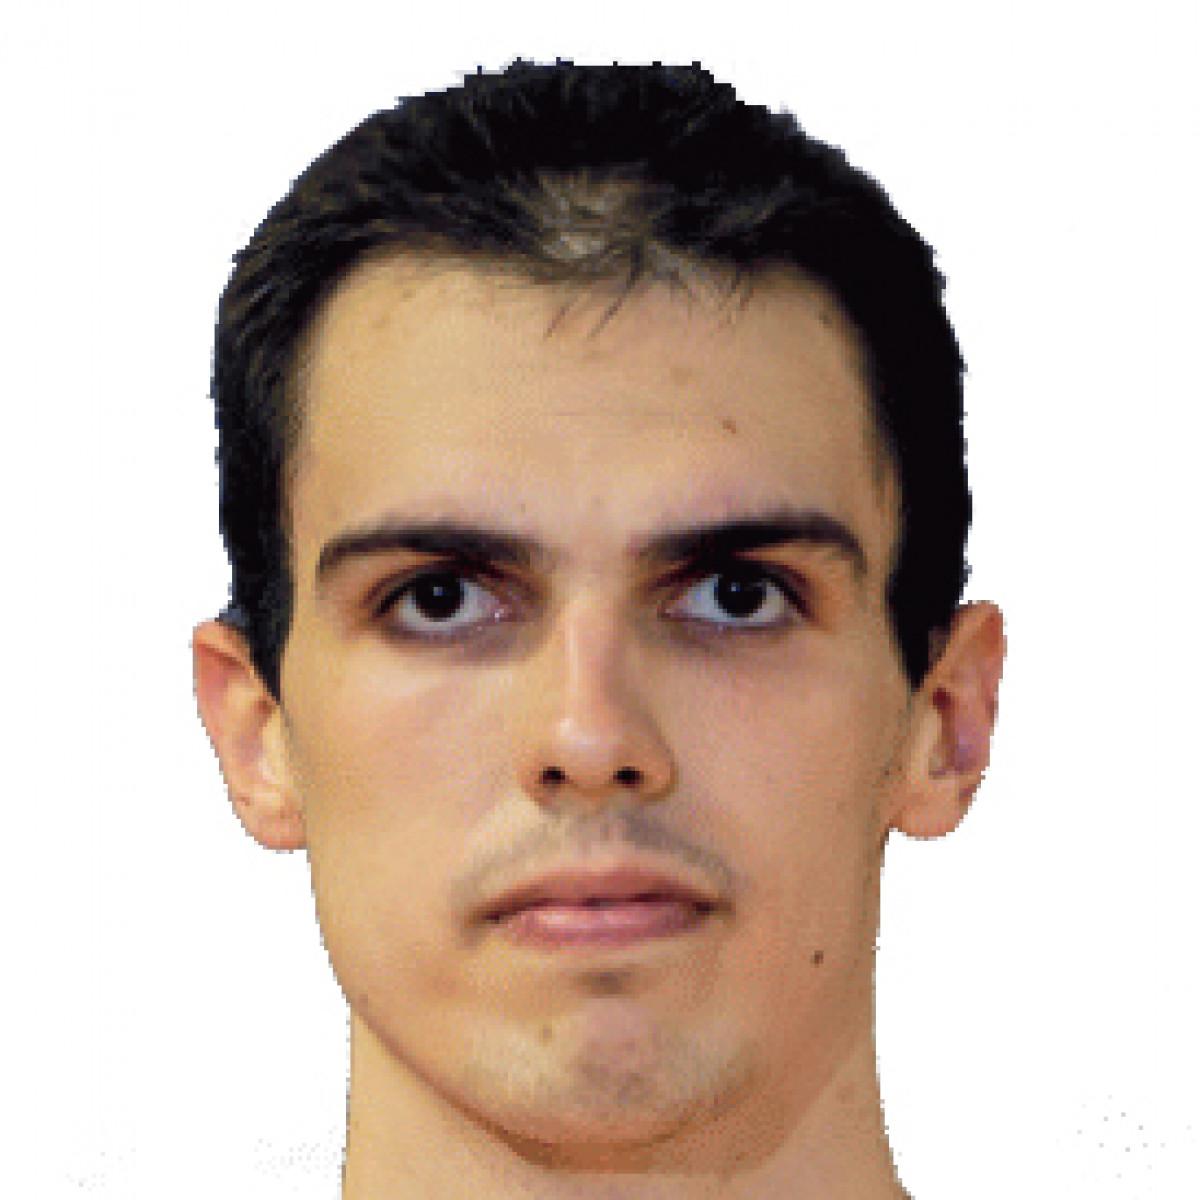 Filip Nikcevic